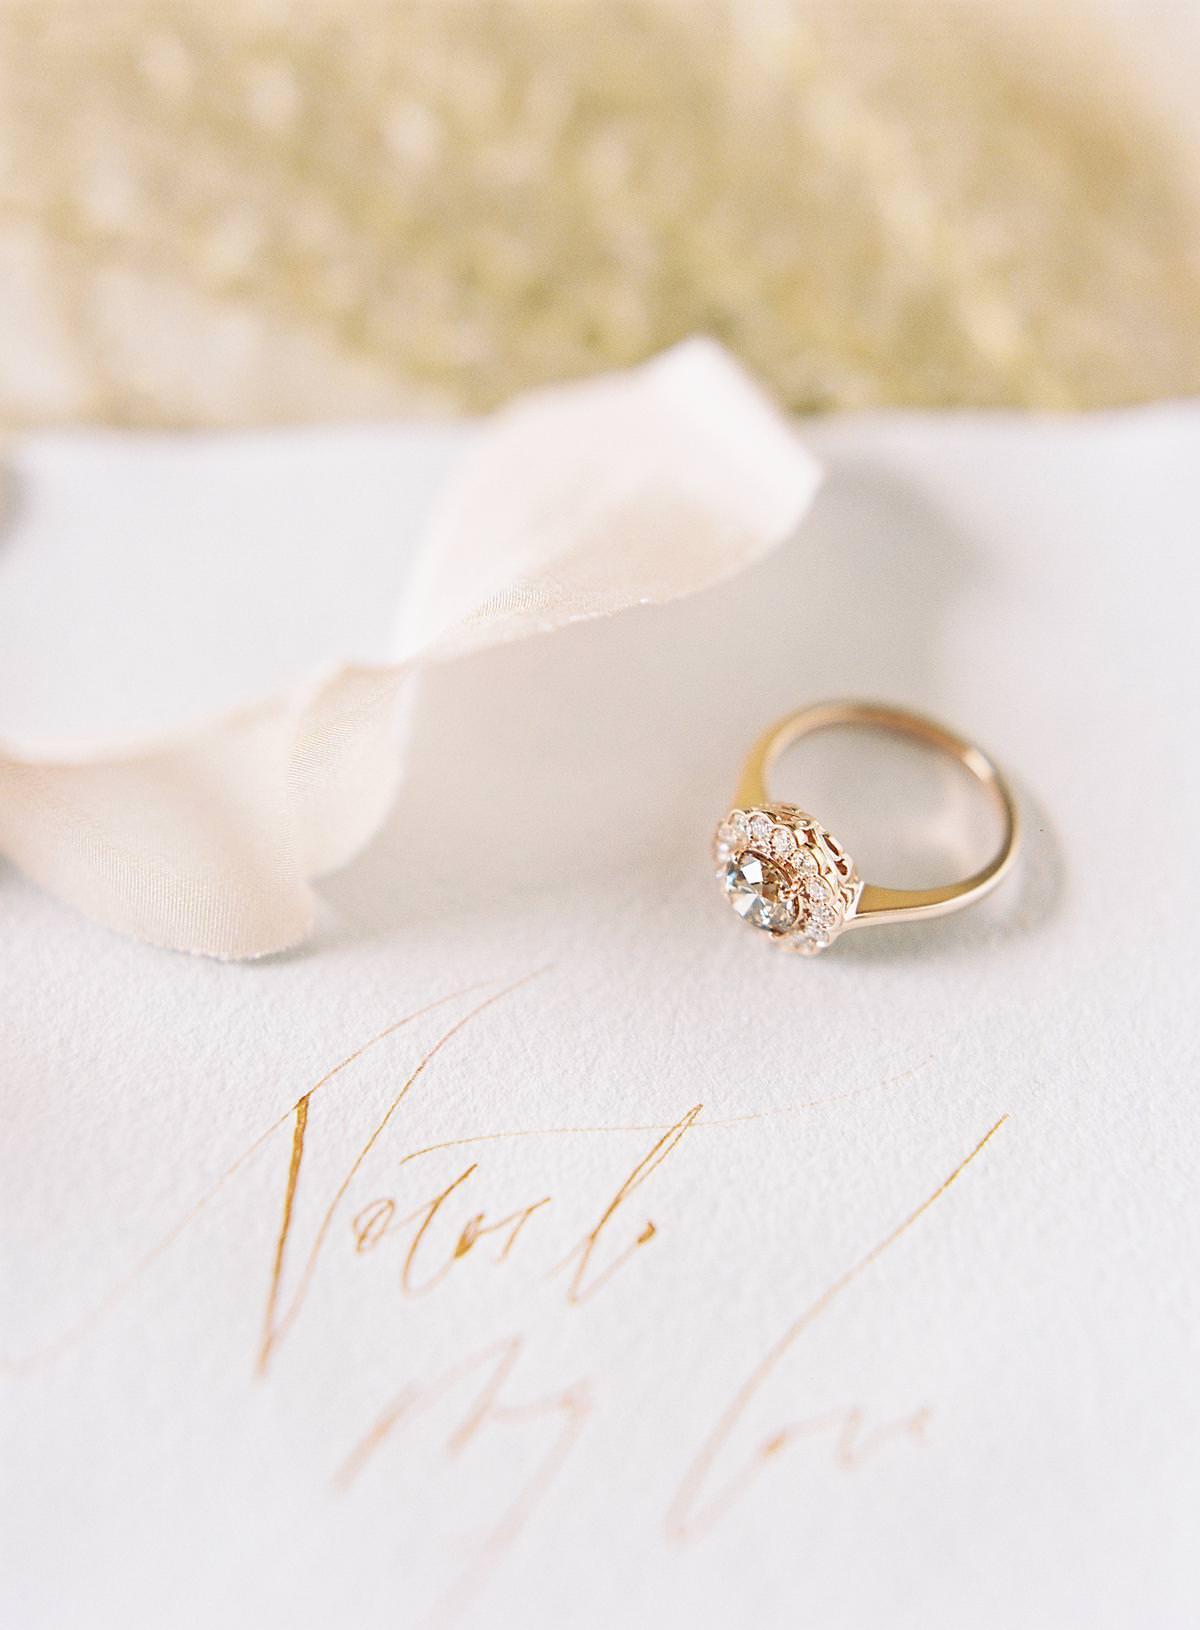 hales jewelers